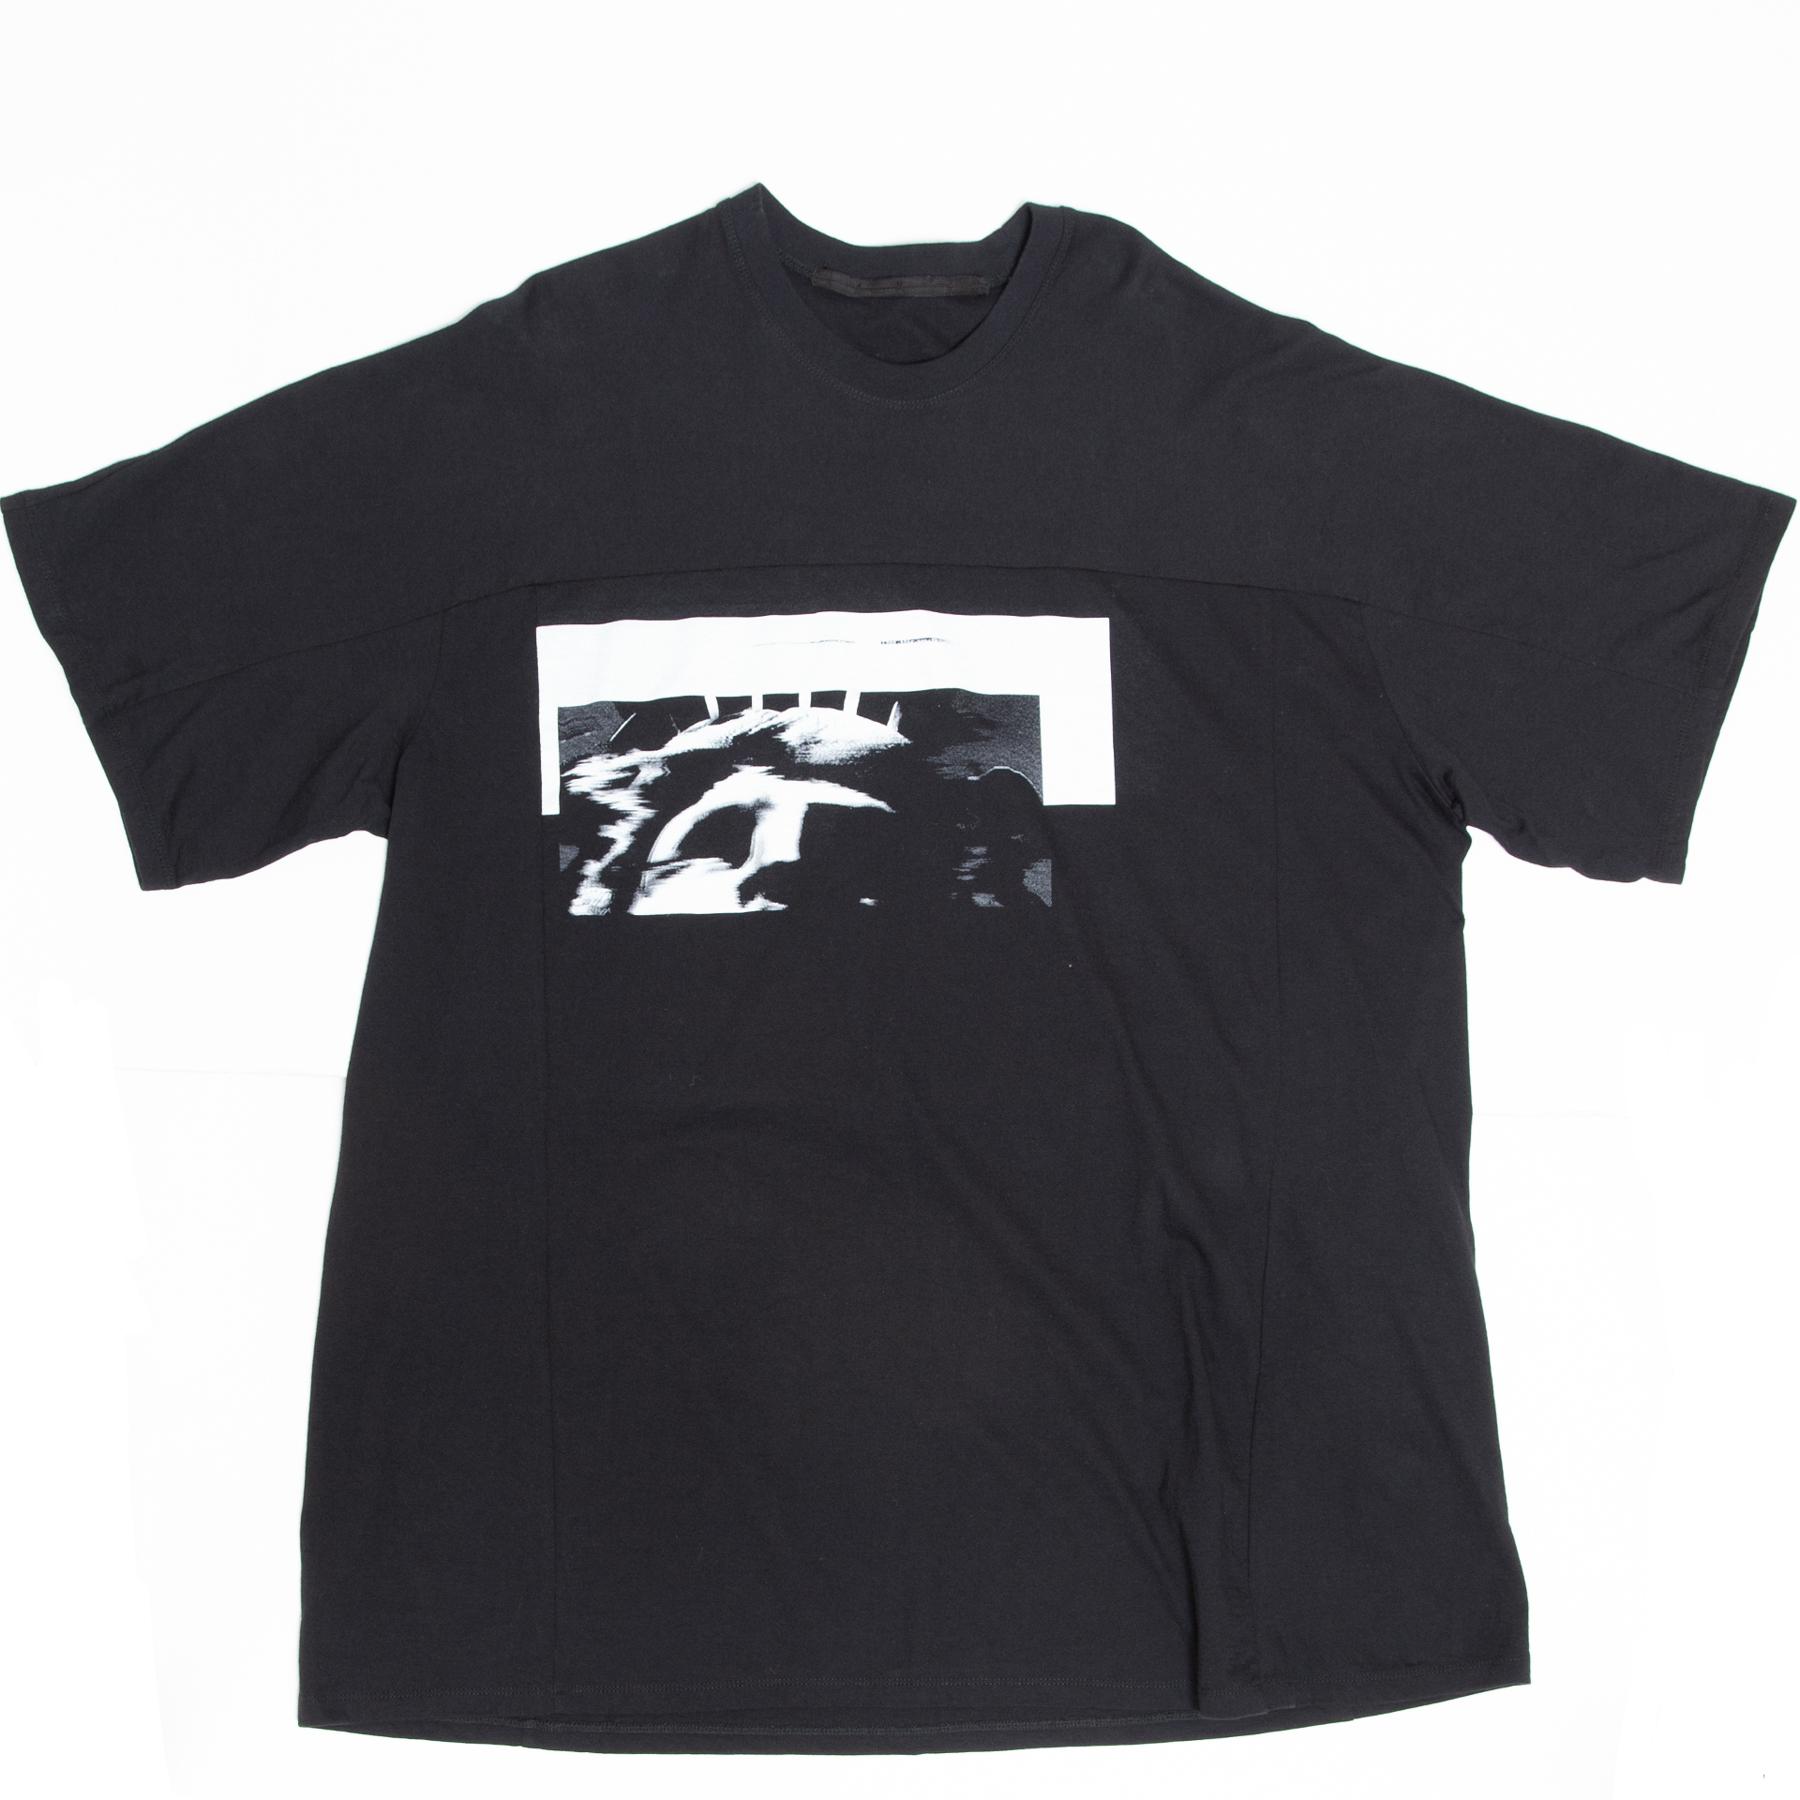 617CPM20-BLACK / S.O.L. ビッグT-シャツ